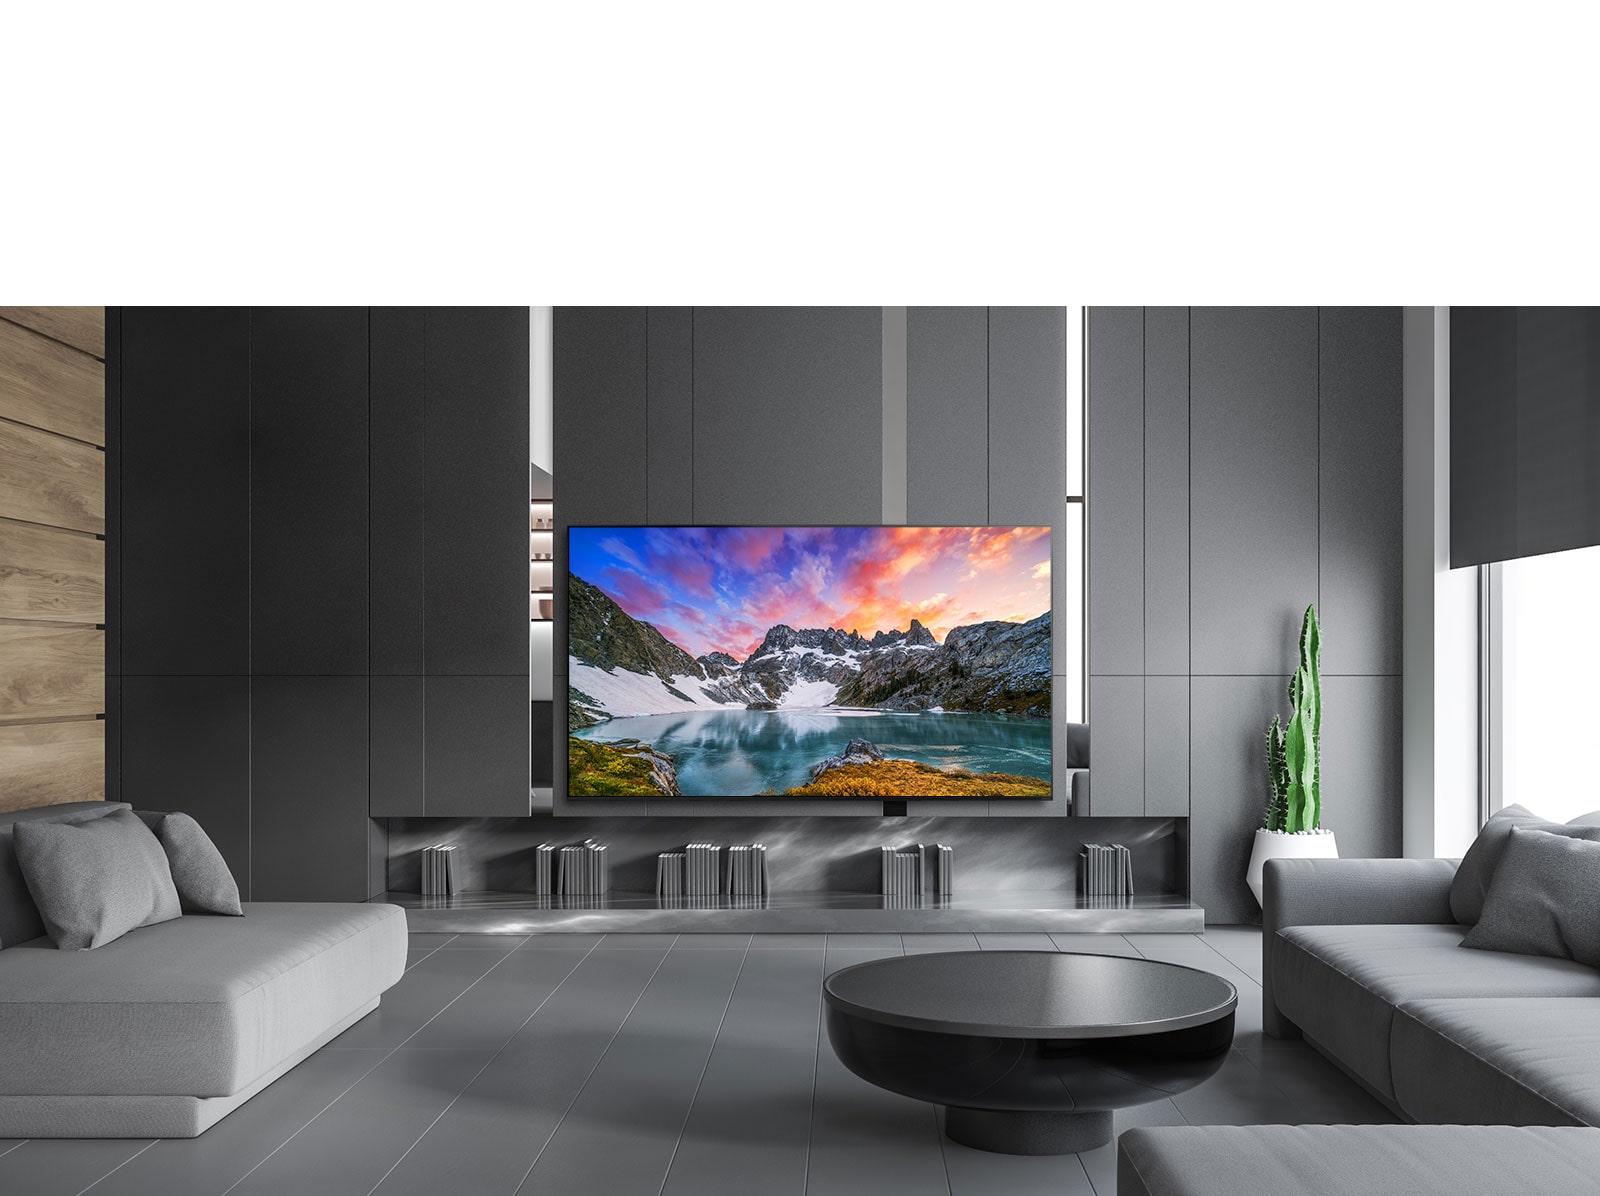 TV menayangkan gambar pemandangan alam dari sudut pandangan mata dalam rumah mewah